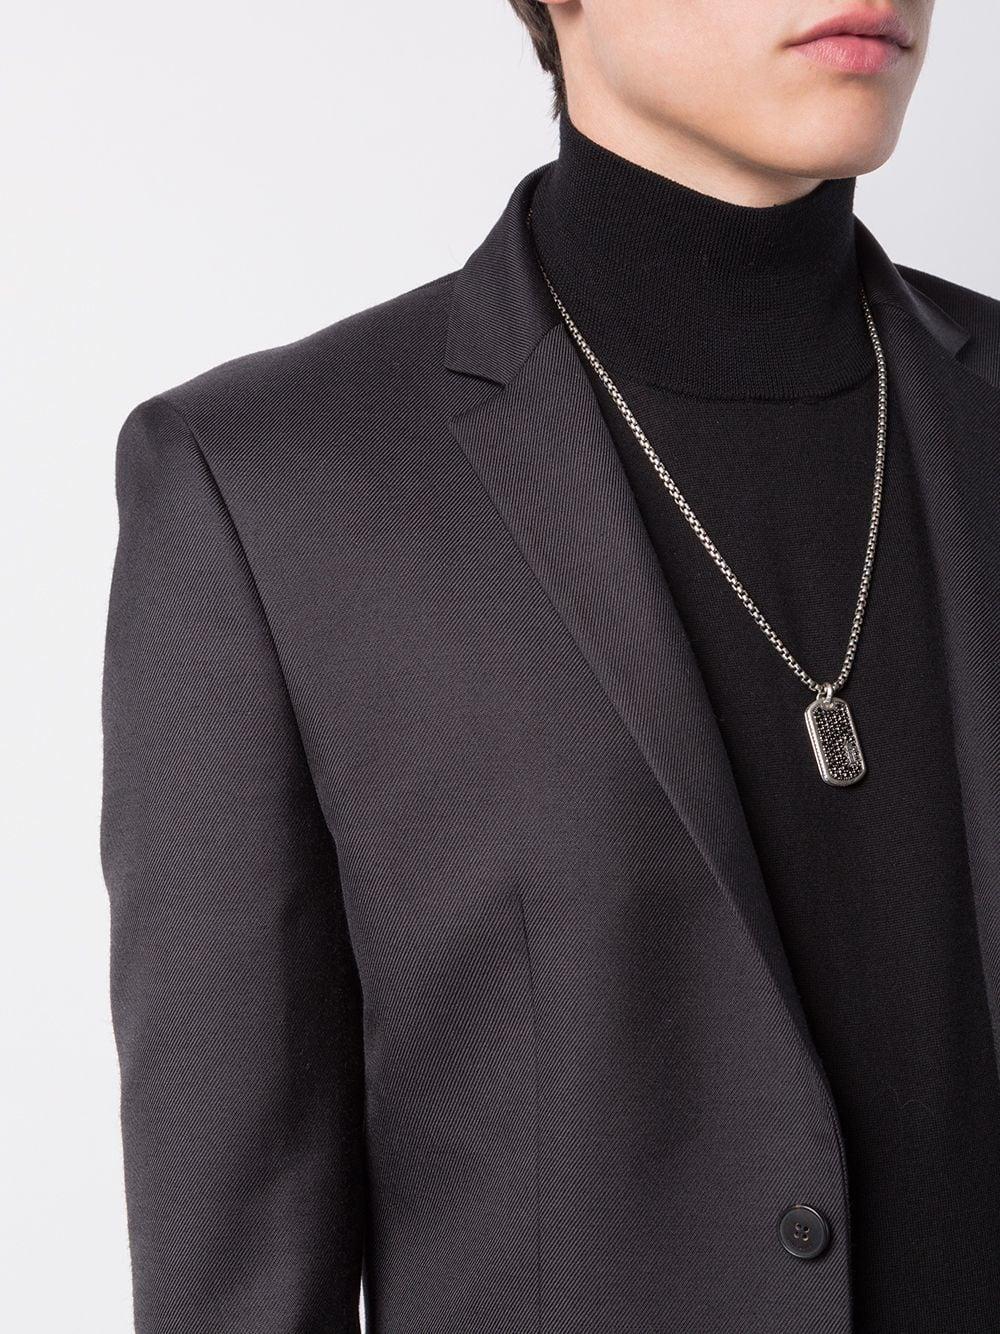 7f7f0034eea8 David Yurman Pavé Diamond Tag Enhancer in Black for Men - Save 1% - Lyst